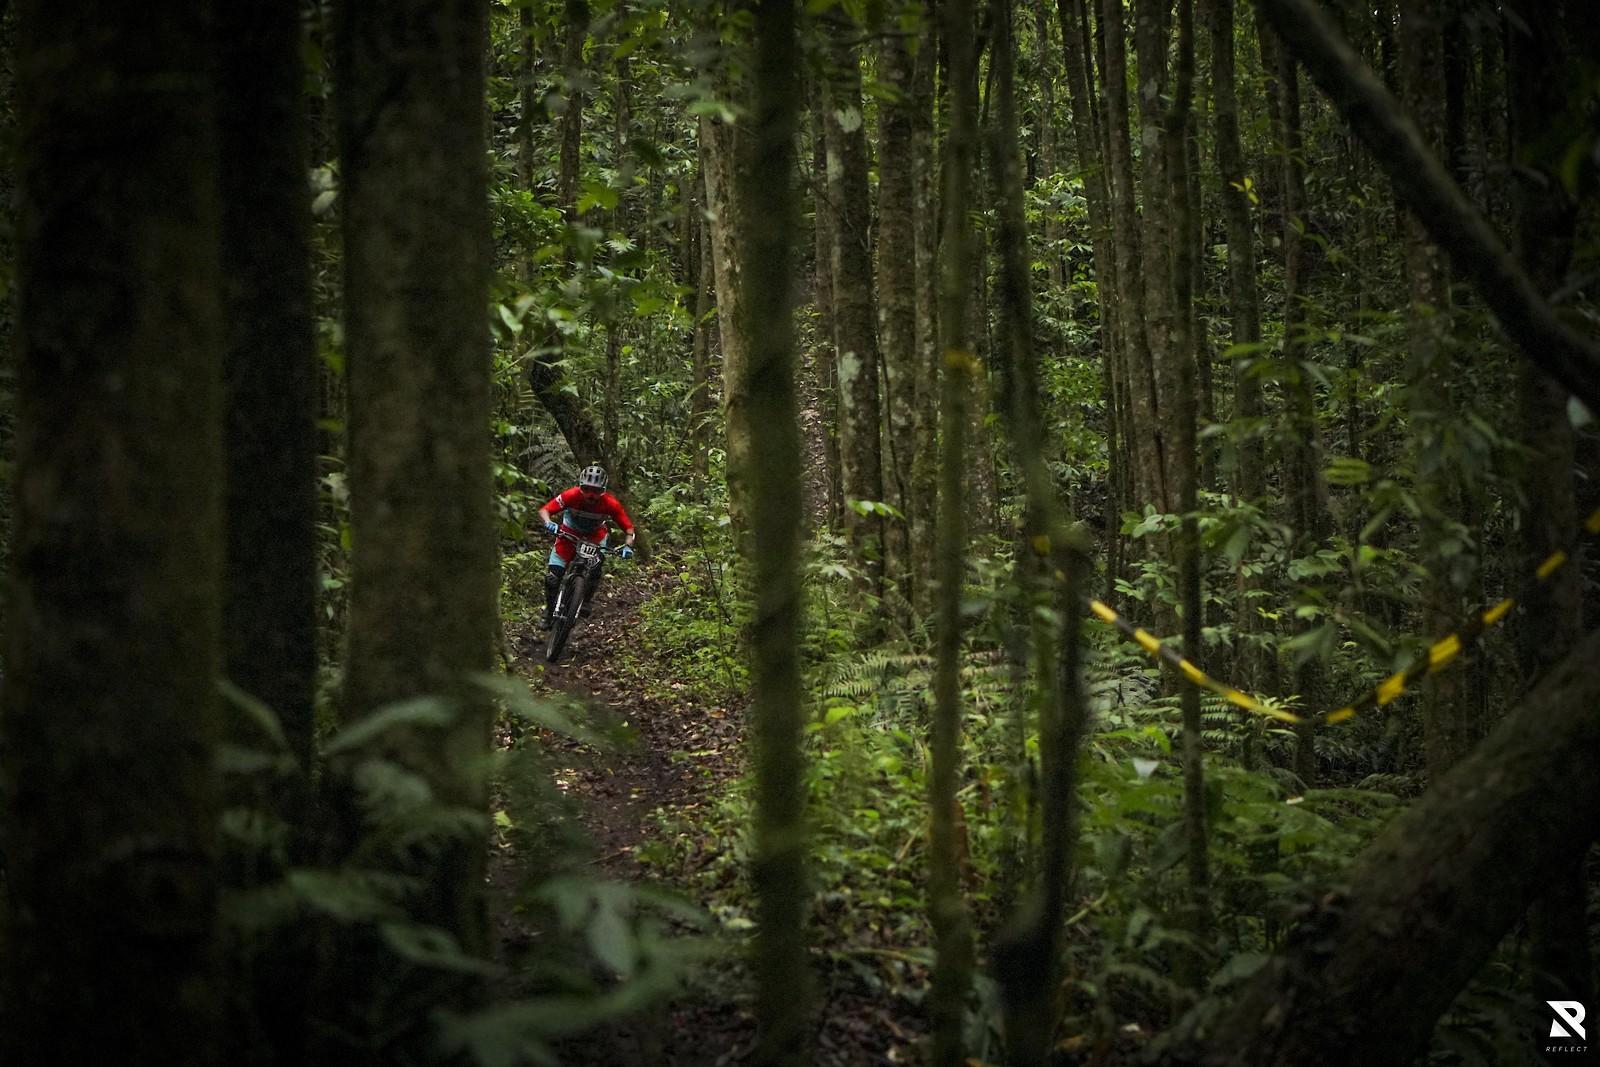 Through the Jungle - Ditra Pranata - RezaAkhmad - Mountain Biking Pictures - Vital MTB